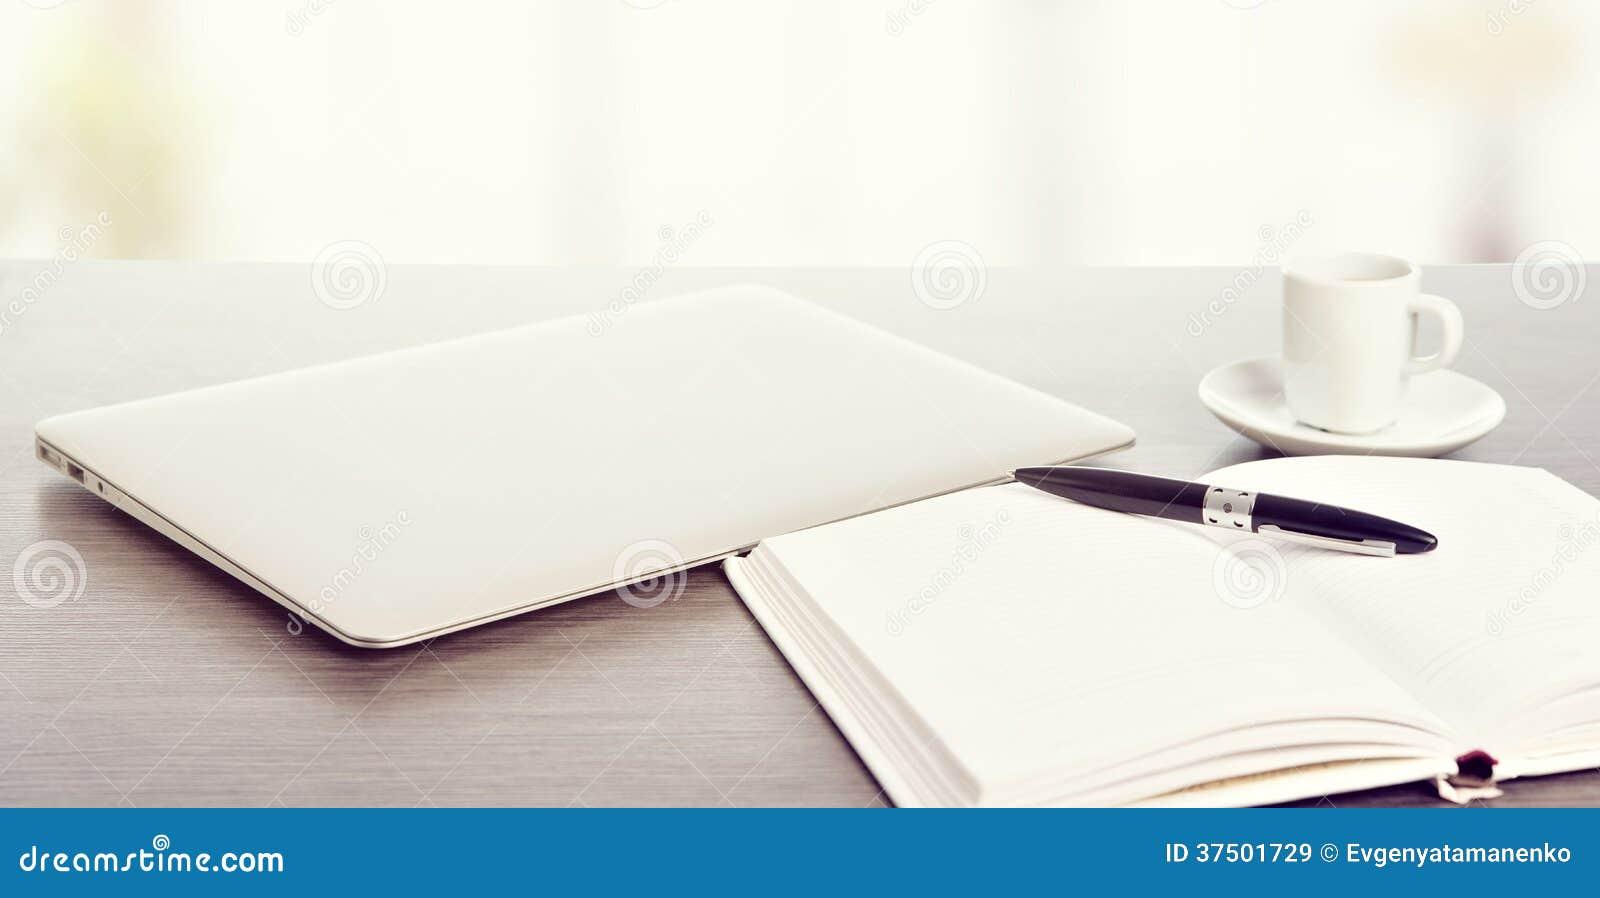 Desktop biuro. Laptop, kawa, notatnik i pióro,